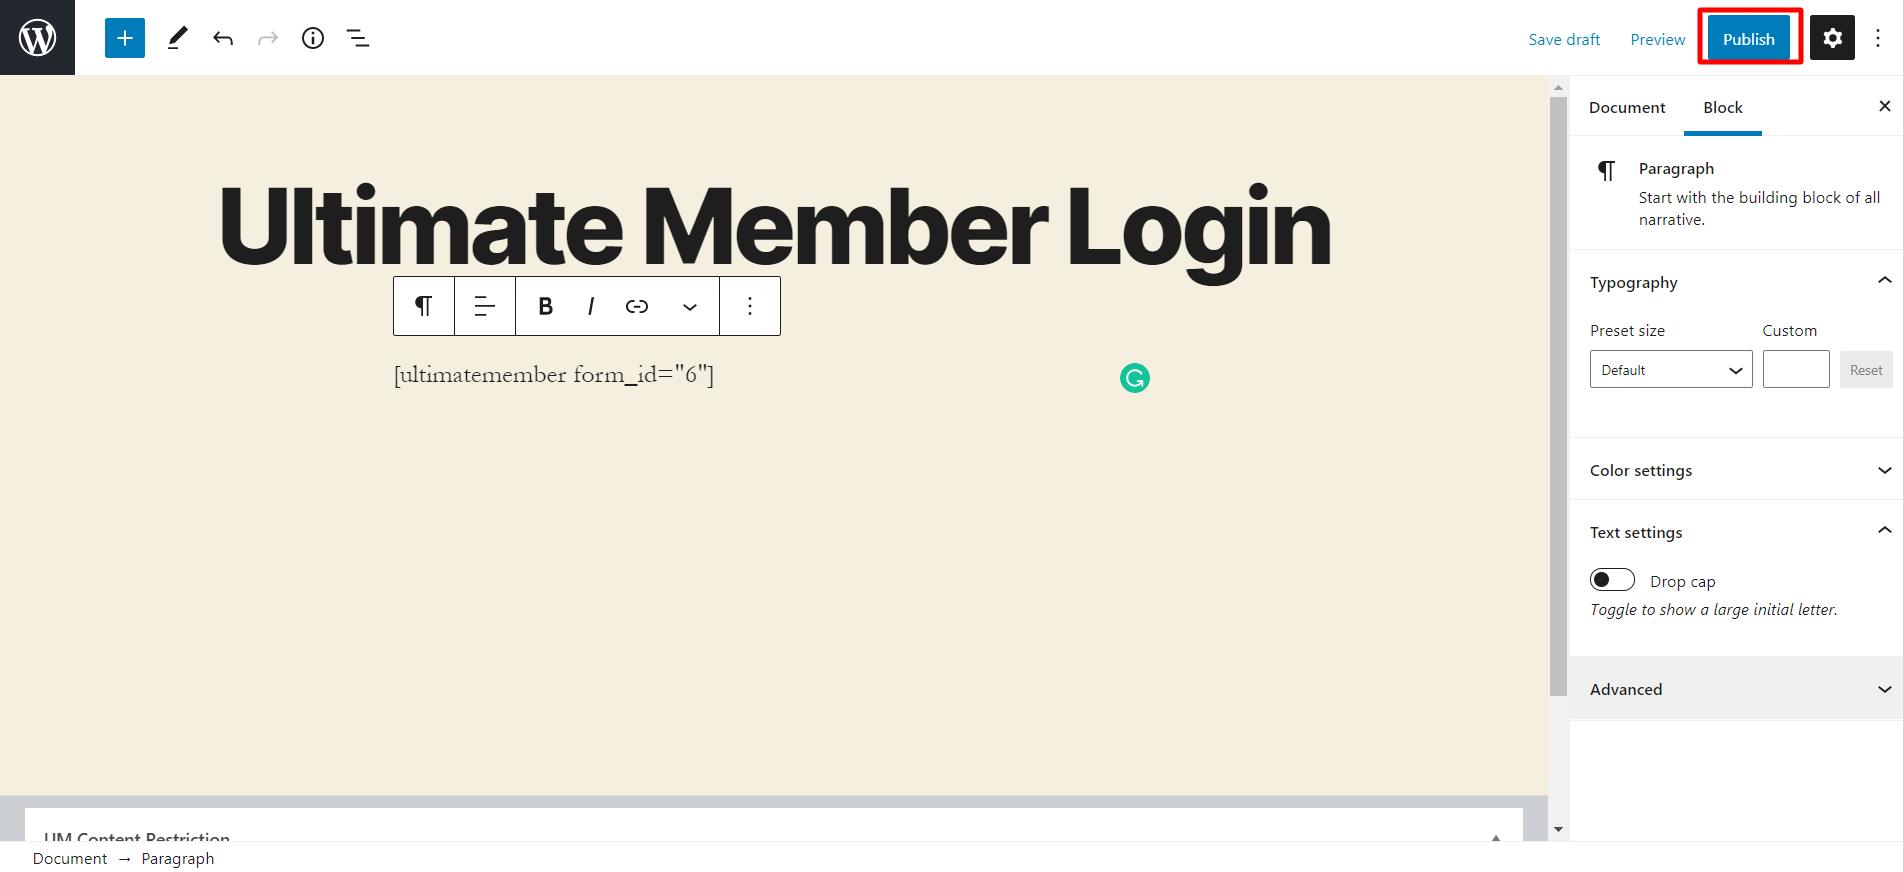 ultimate member login integration publish